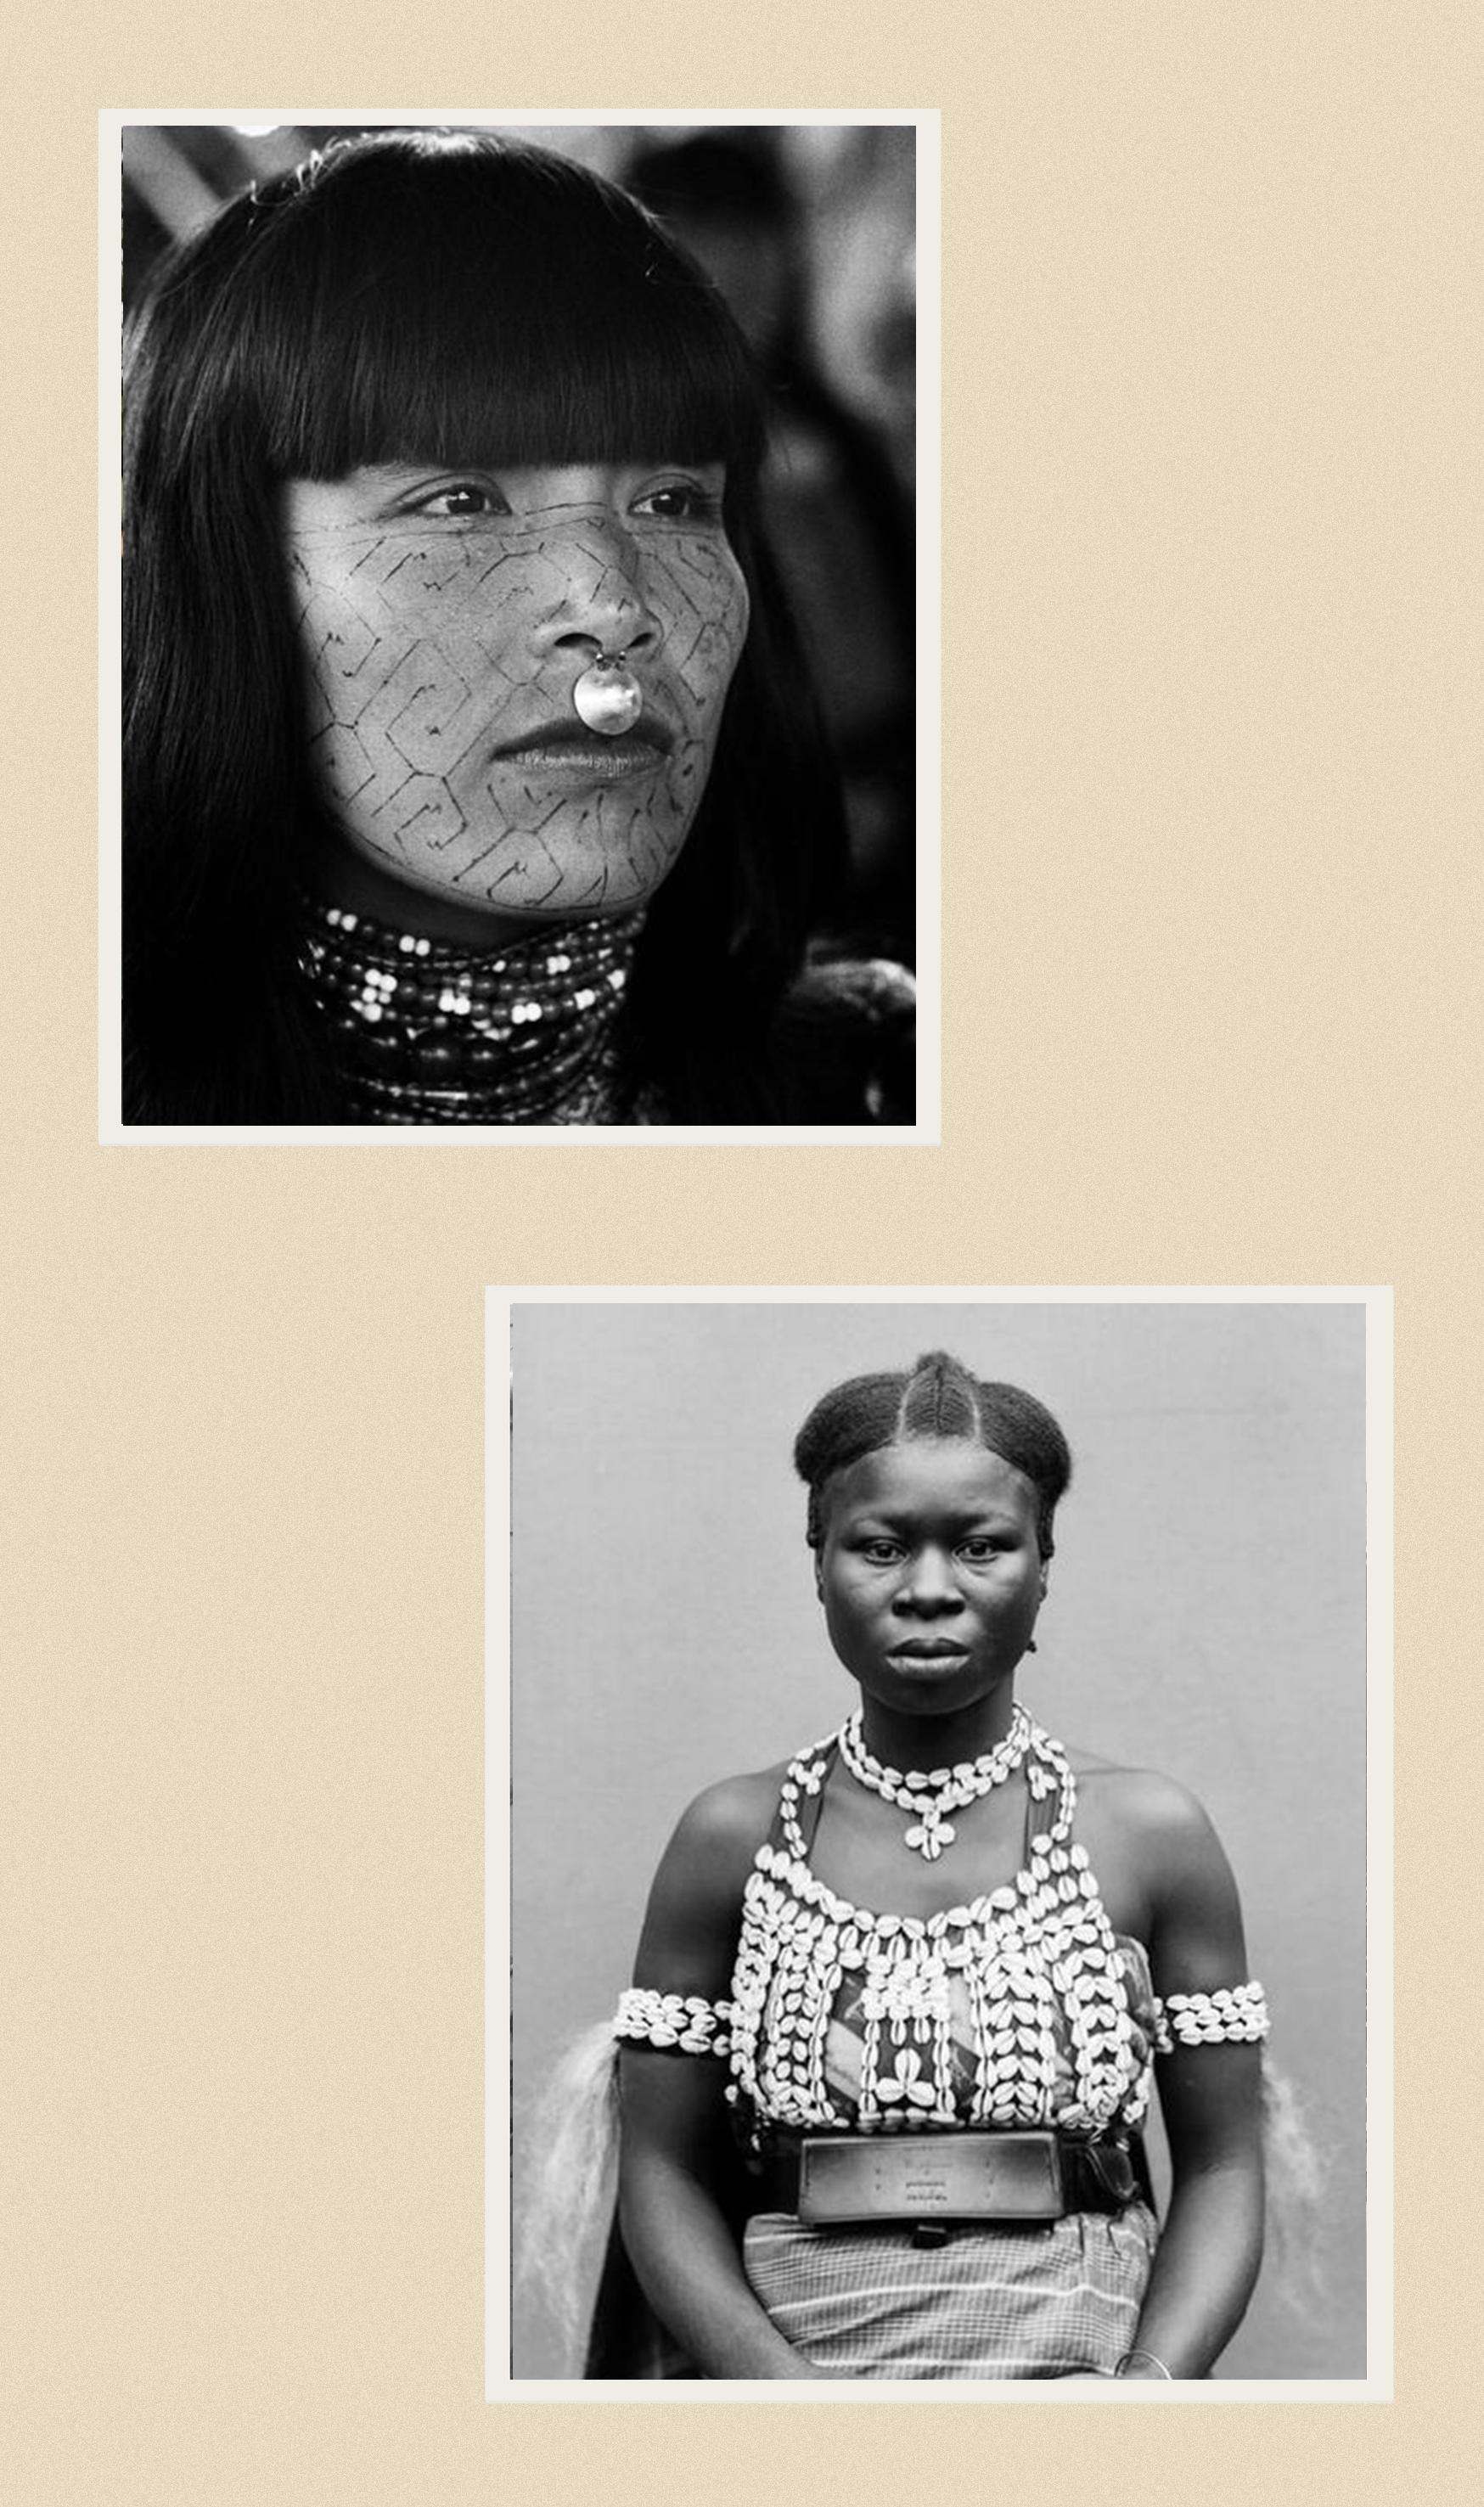 A Shipibo woman photographed by Thomas Hoepker, 1962 Courtesy of Musée du Quai Branly